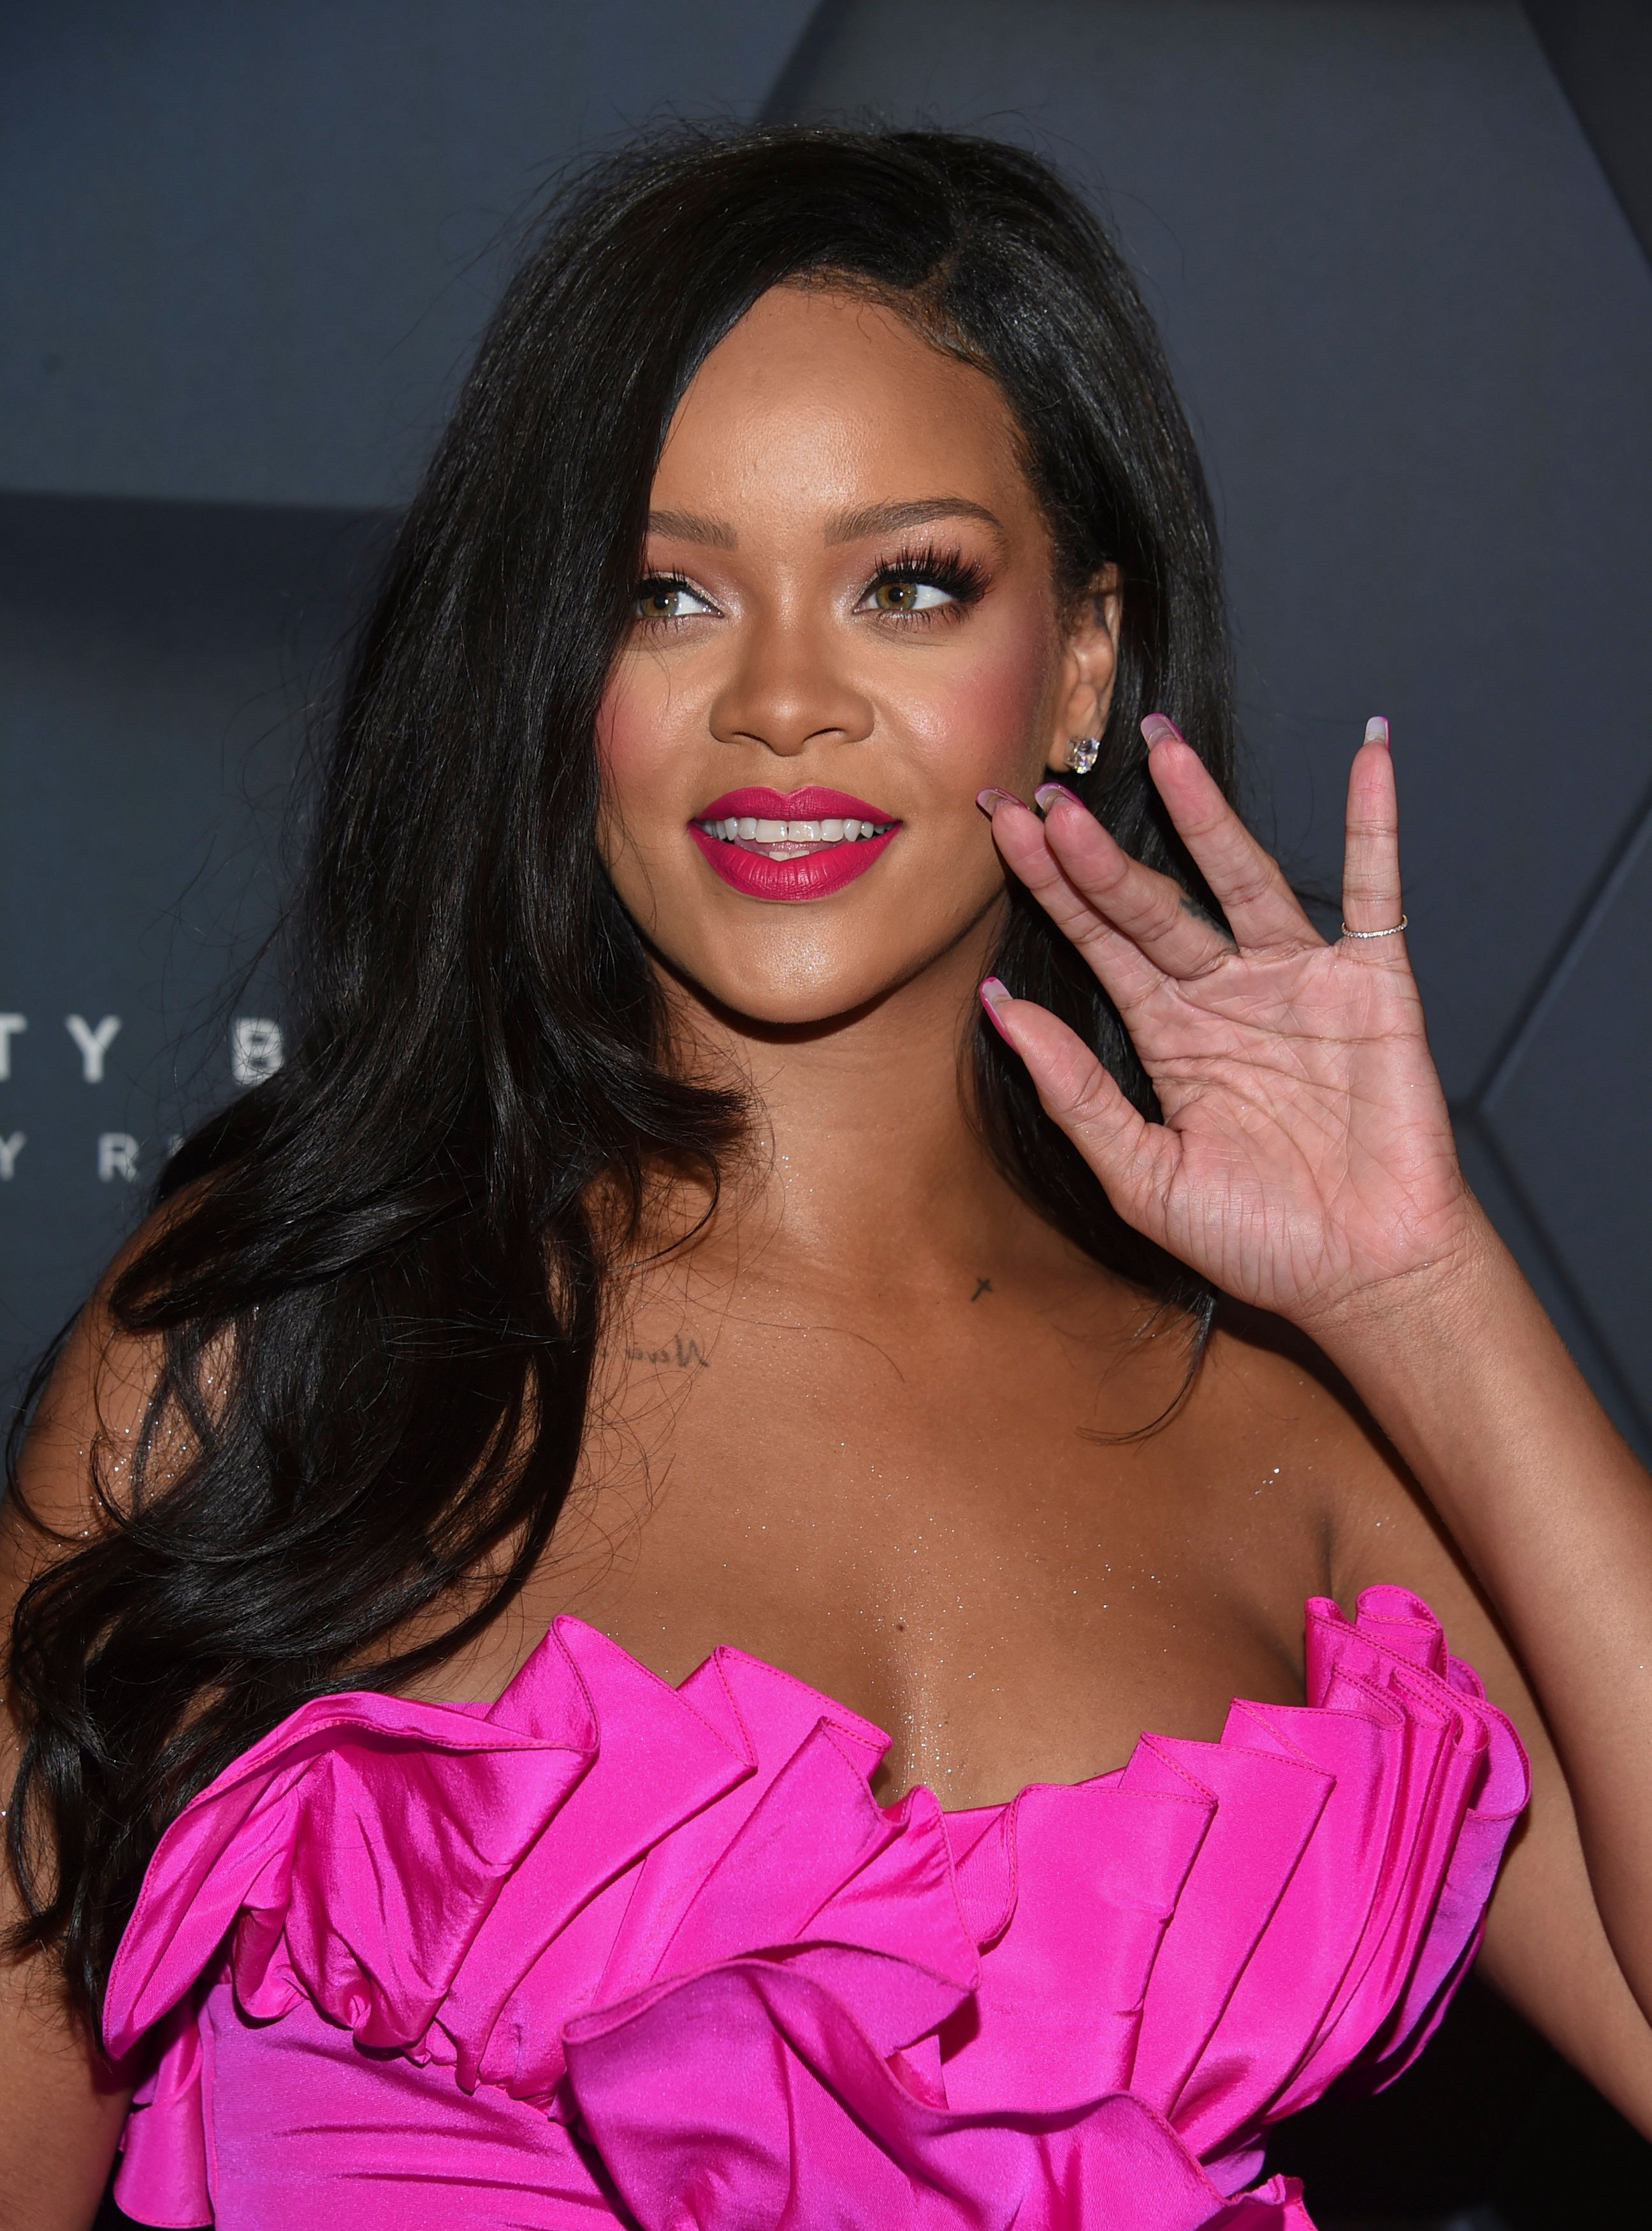 Rihanna Tells Fans Her New Album Will Drop In